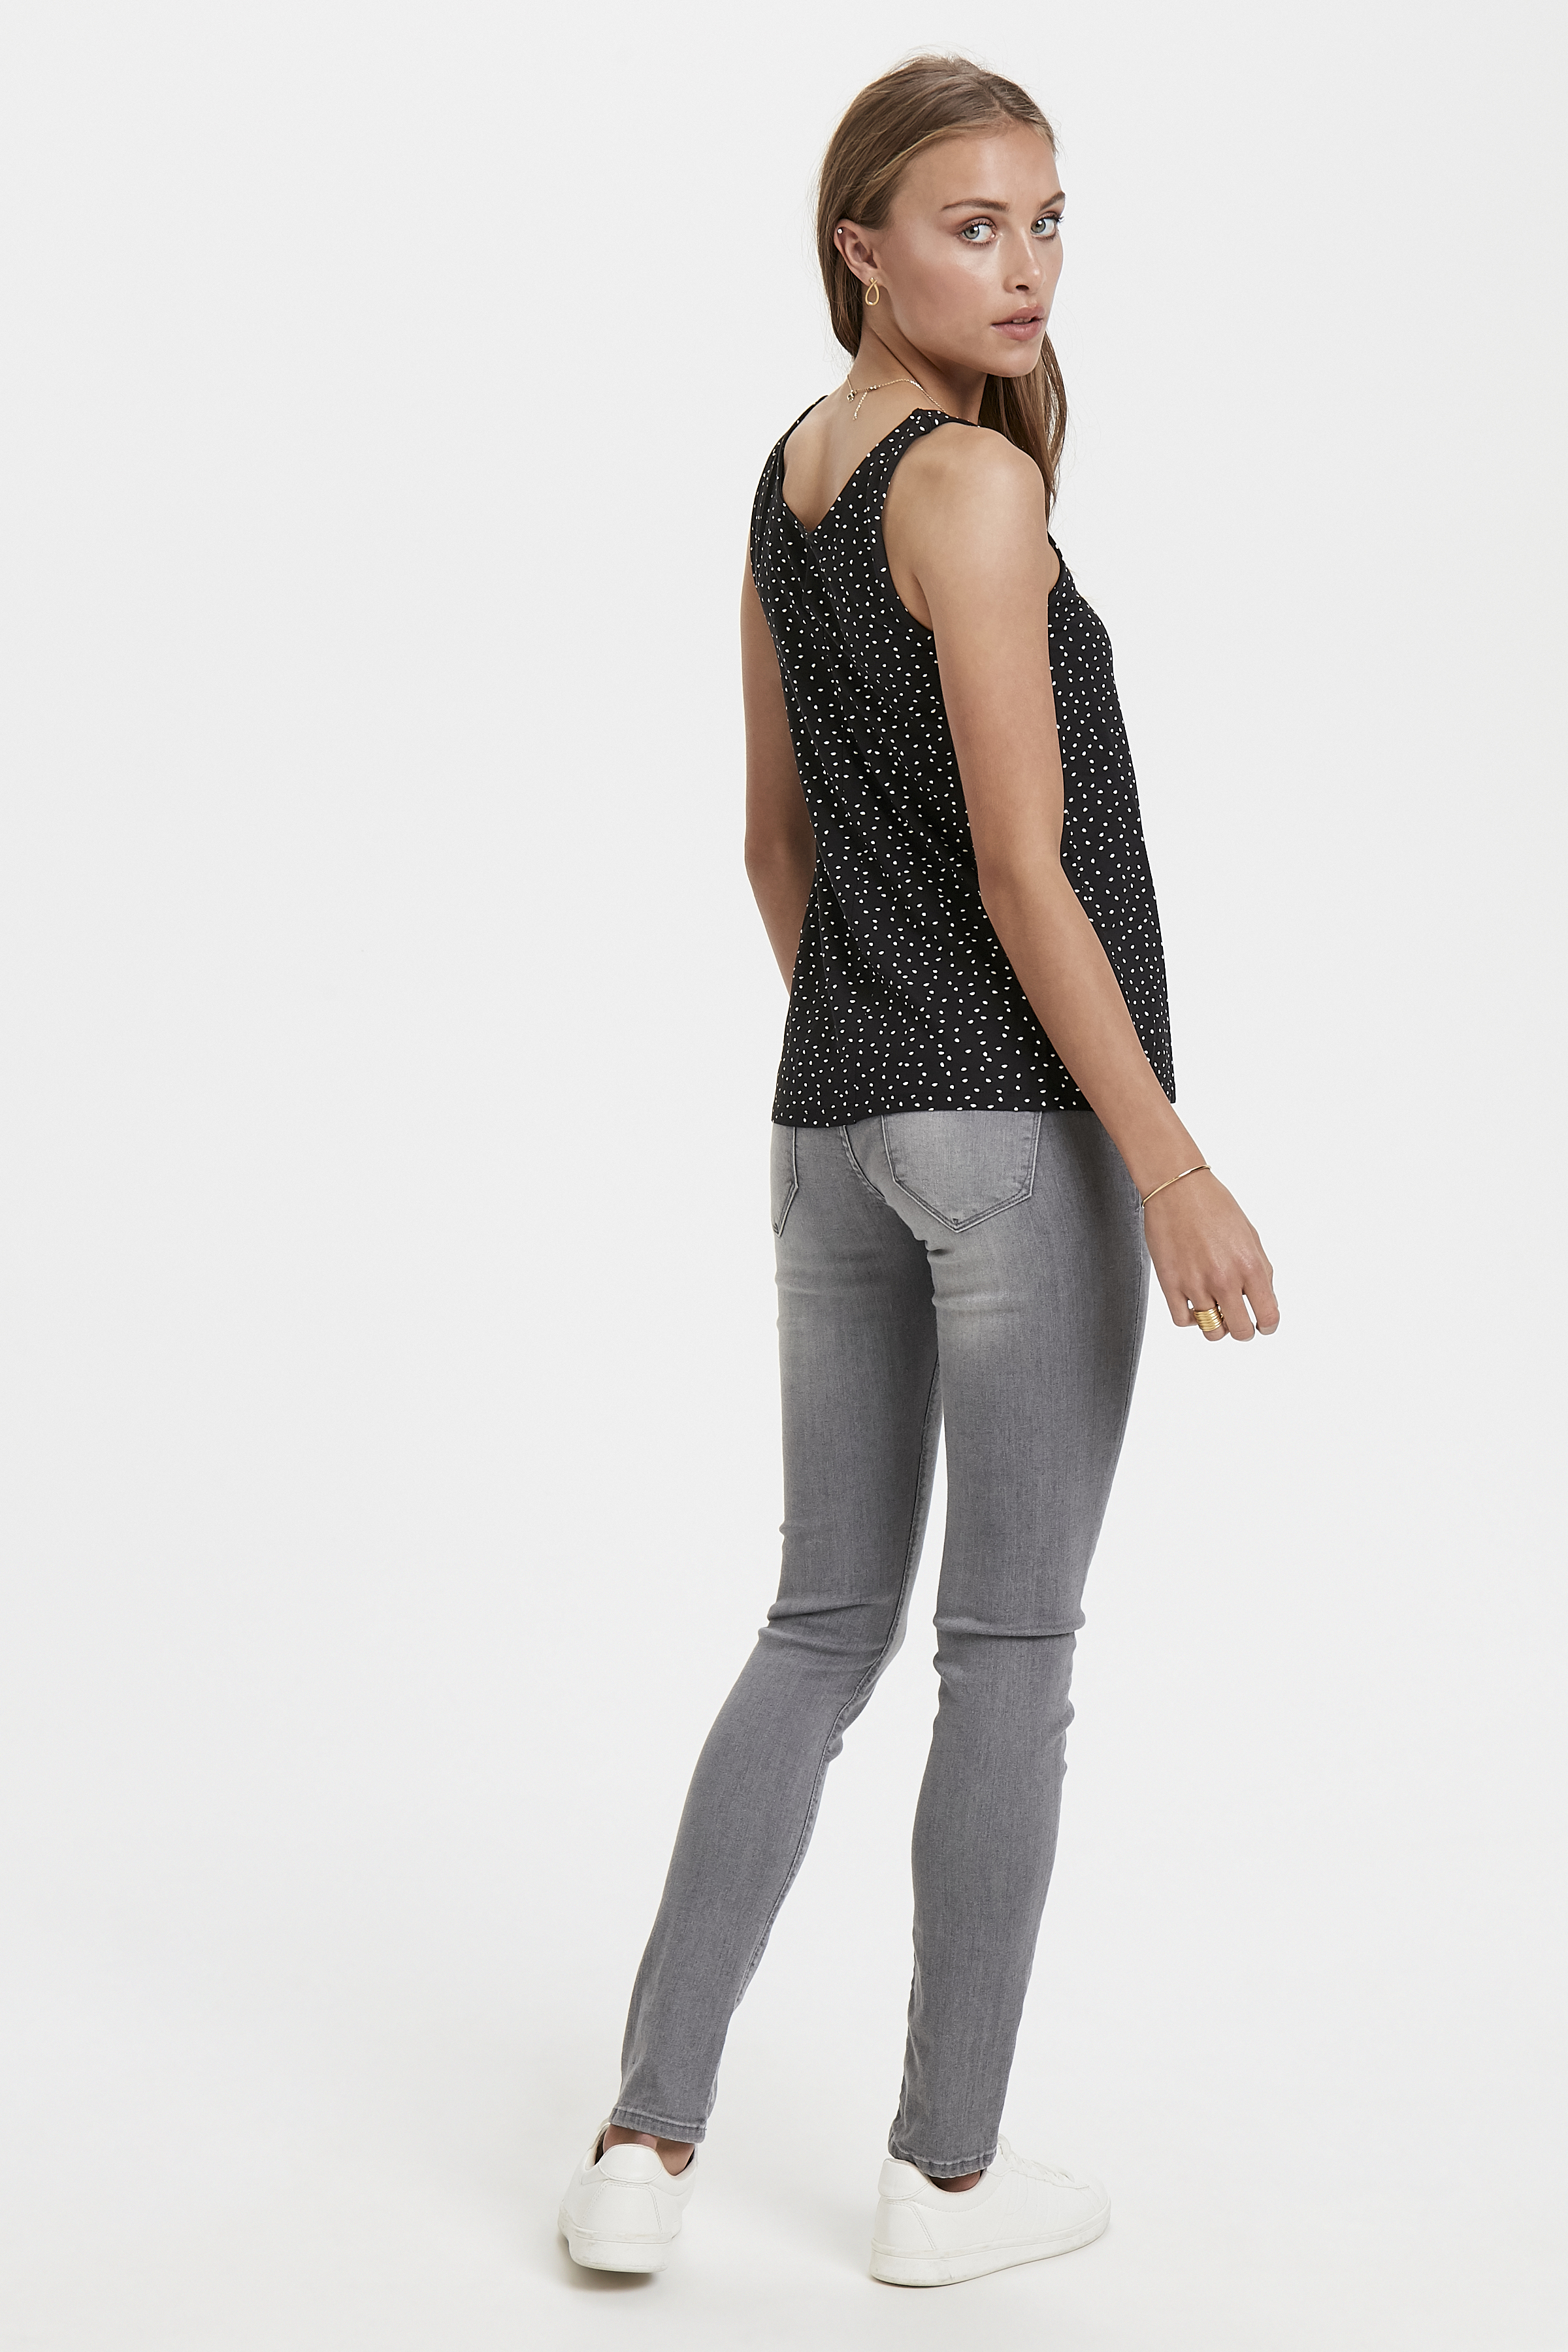 Black Printed Jerseytop – Køb Black Printed Jerseytop fra str. XS-XL her